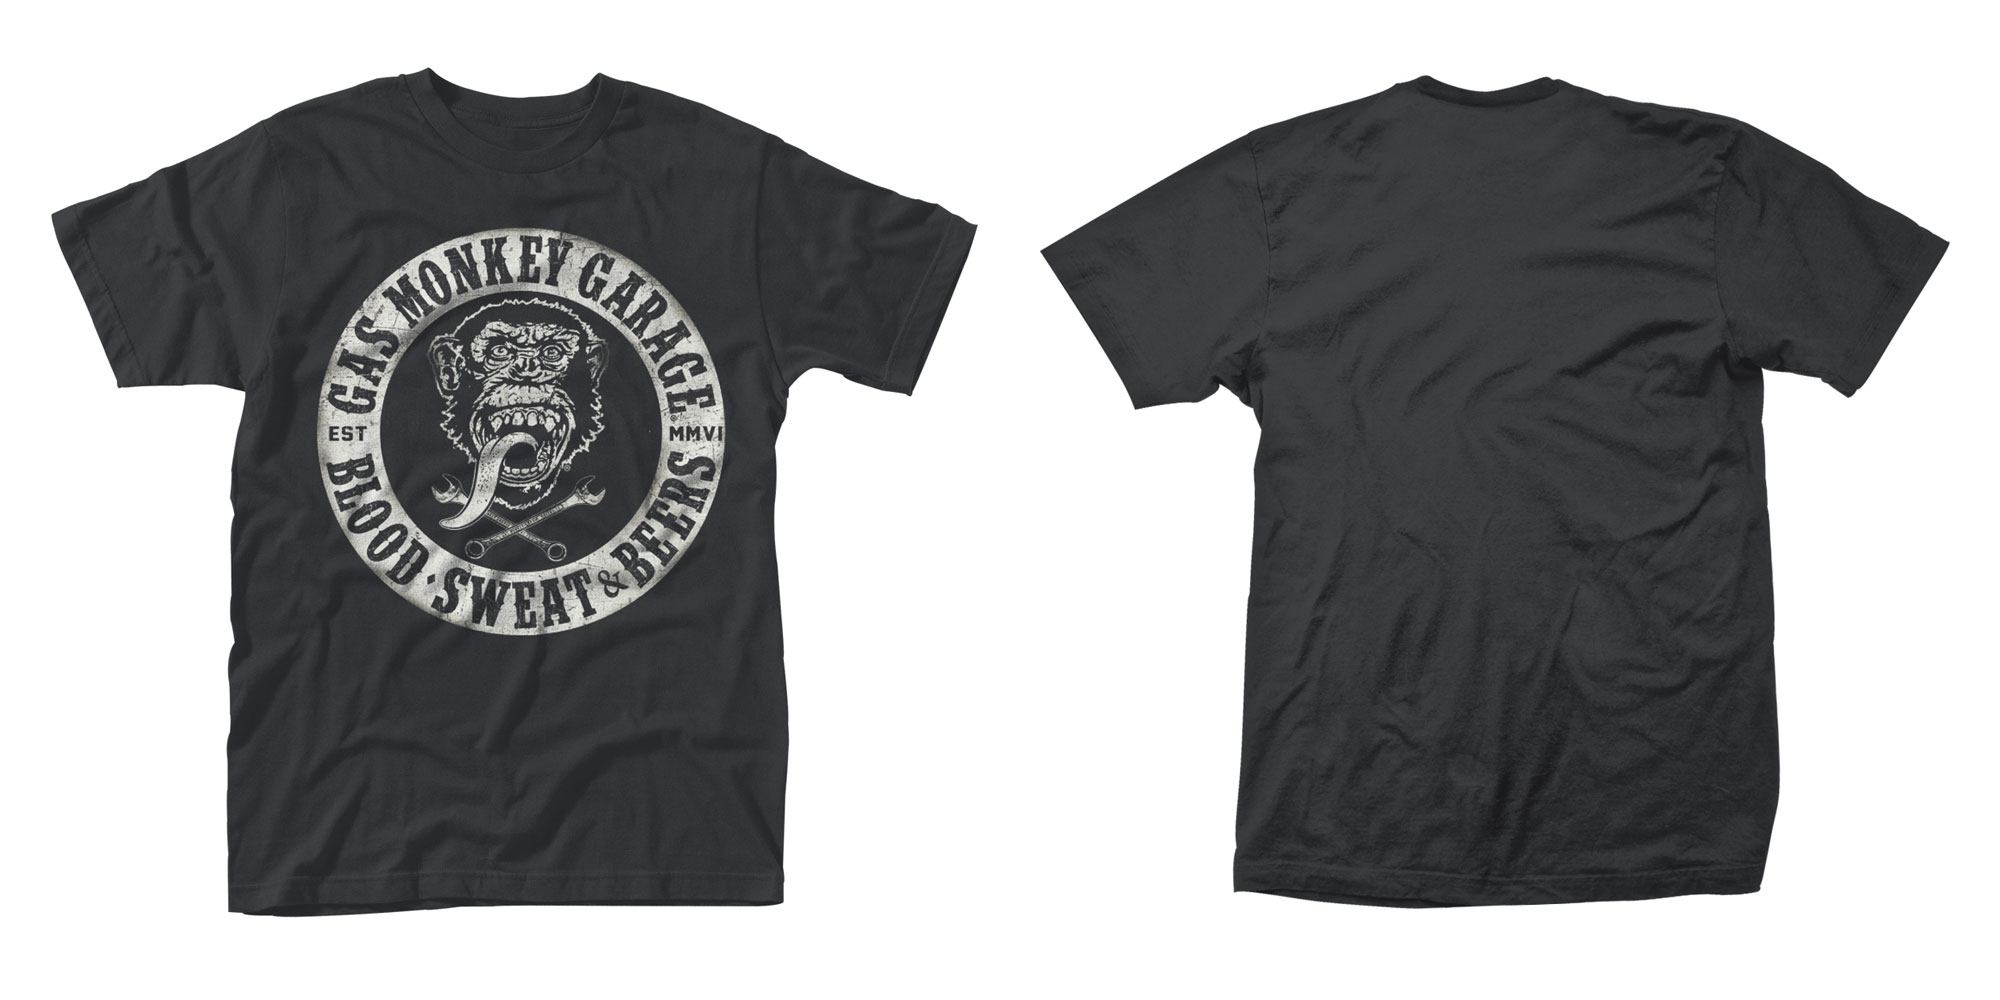 Gas Monkey Garage T-Shirt Blood, Sweat & Tears Size M